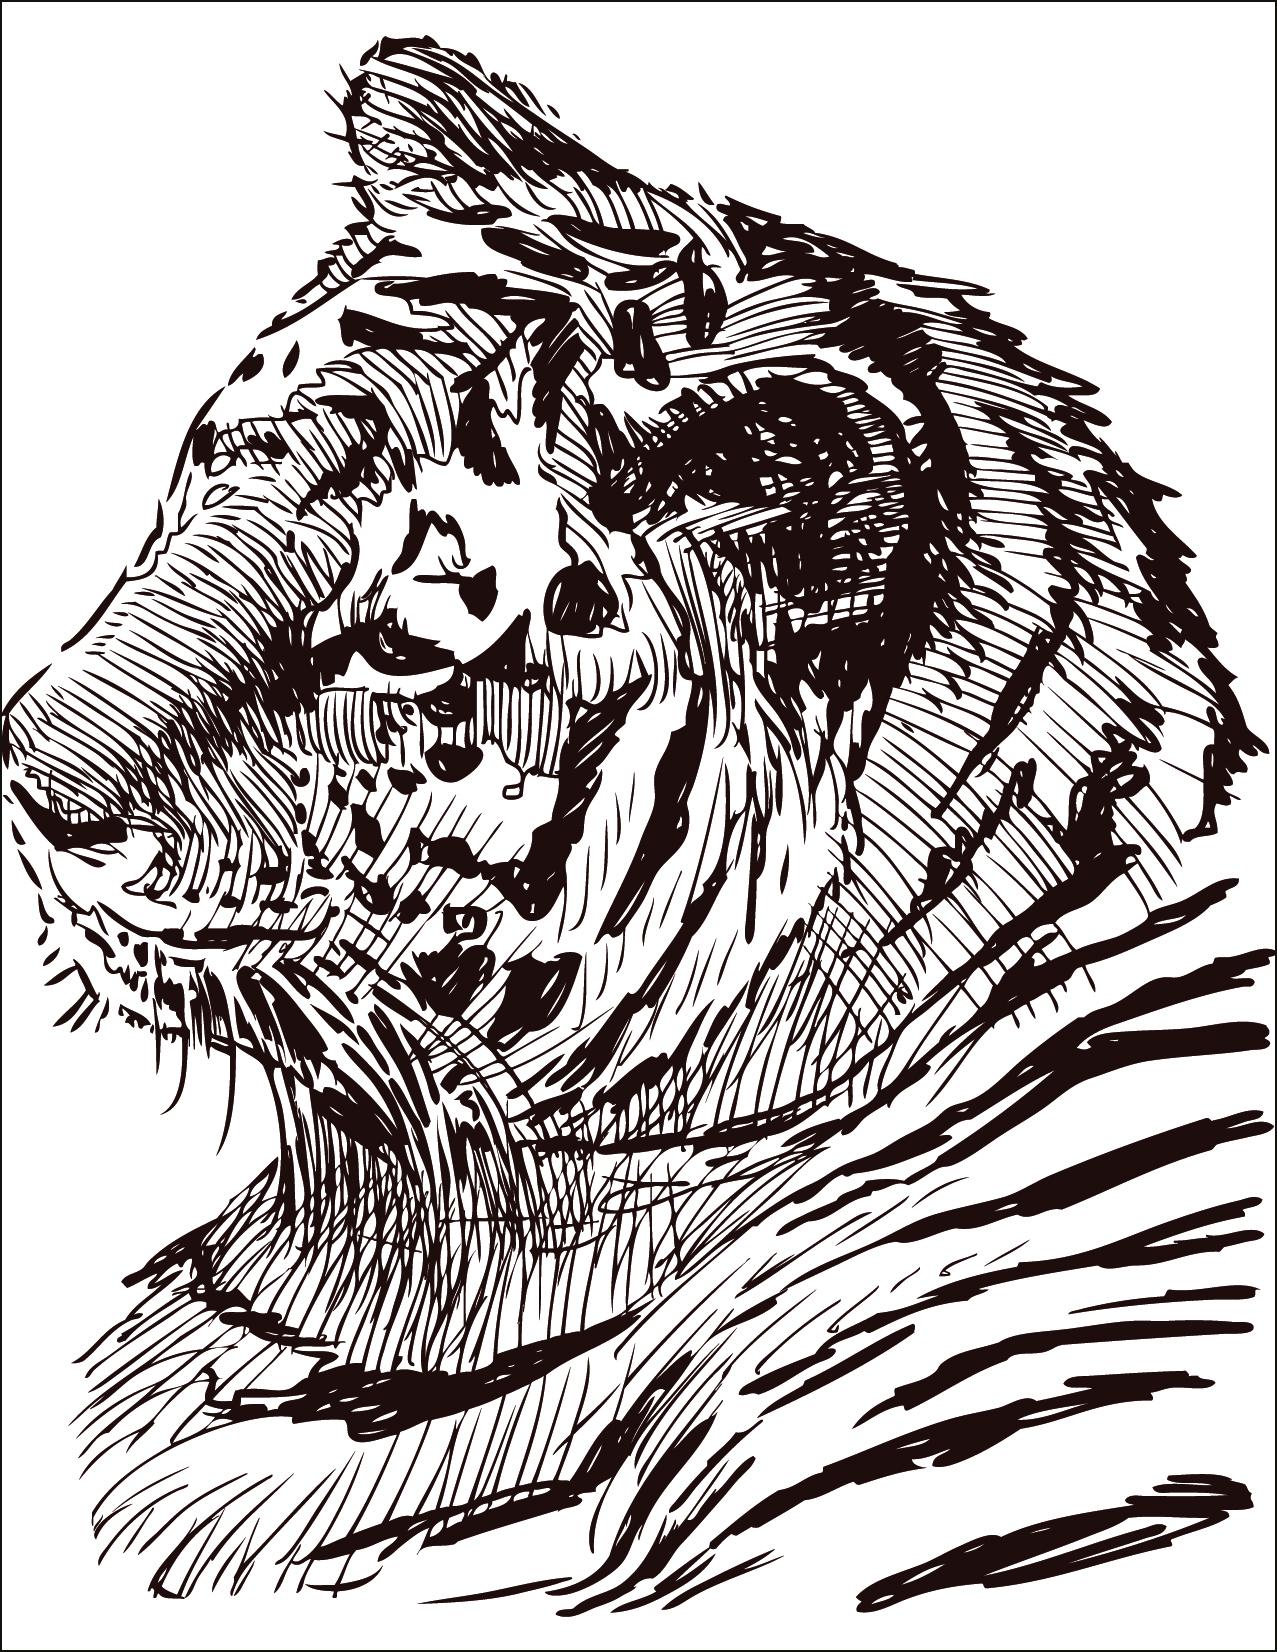 Dessin À Colorier Gratuit Félin Tigre - Artherapie.ca intérieur Mandalas De Tigres